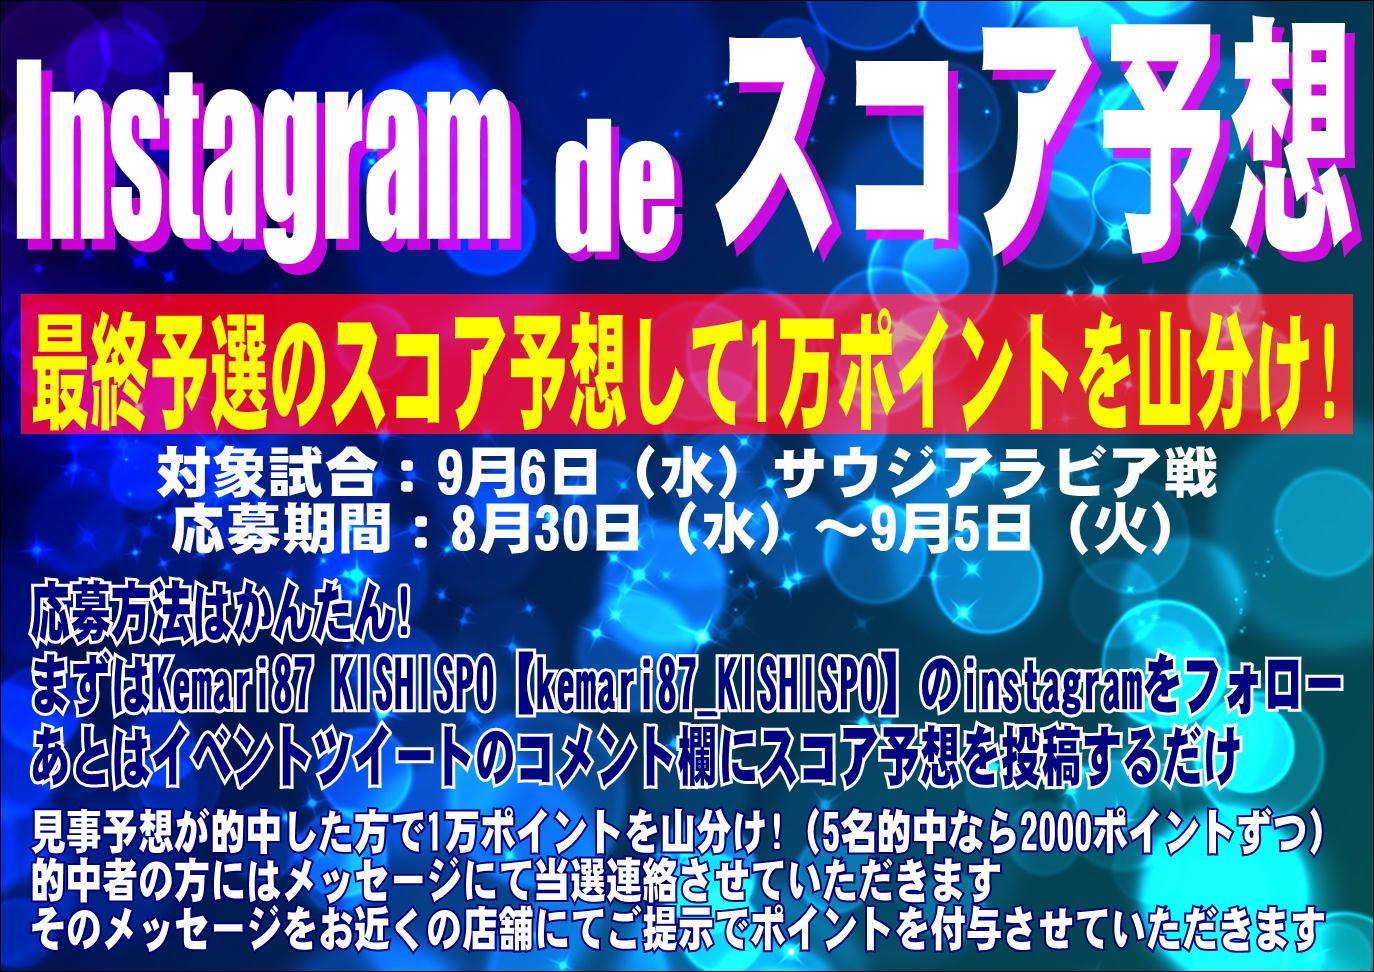 Instagram de スコア予想!_e0157573_19050386.jpeg